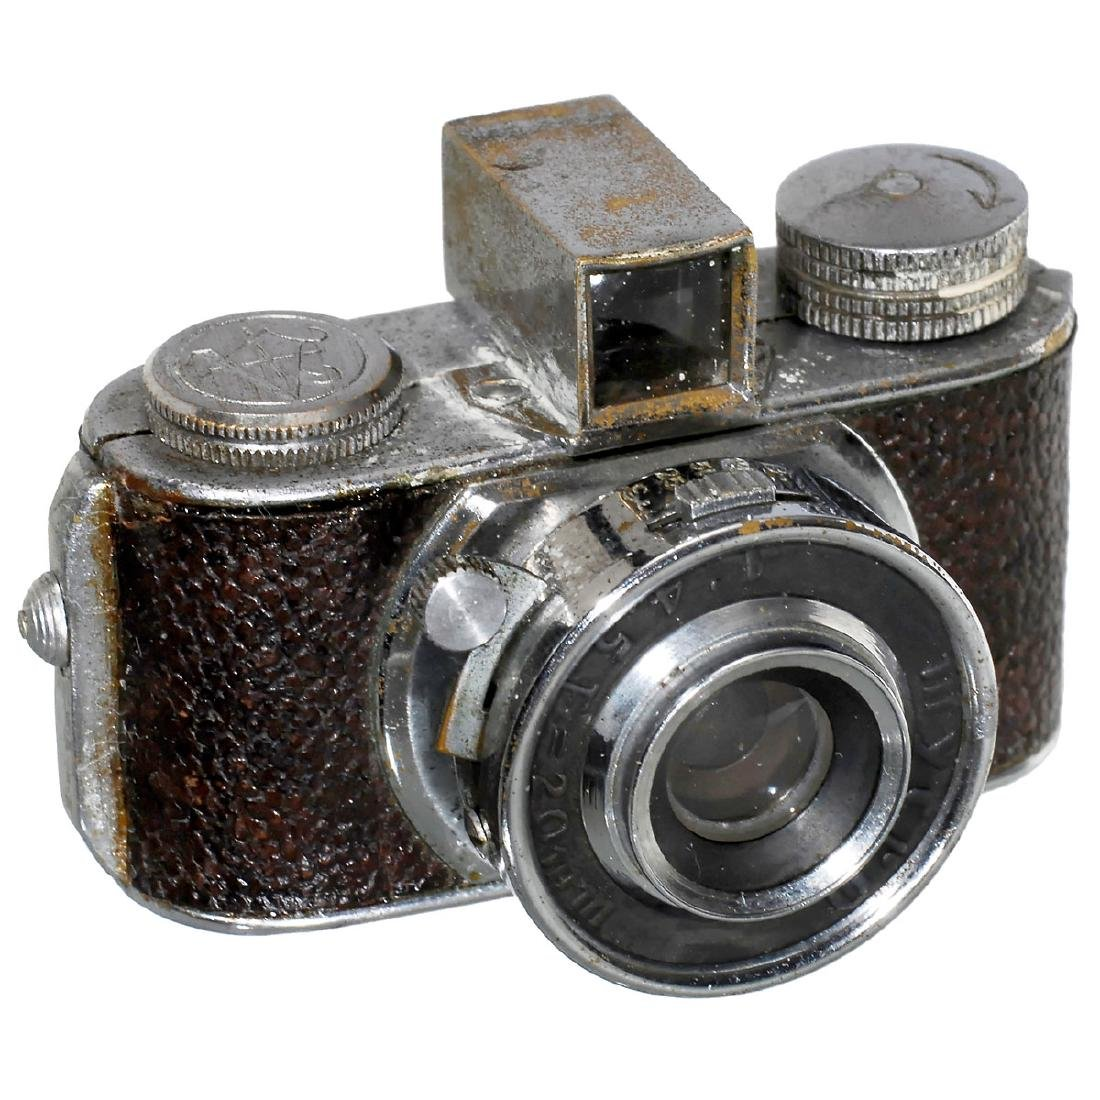 Mycro (Original Model), c. 1938